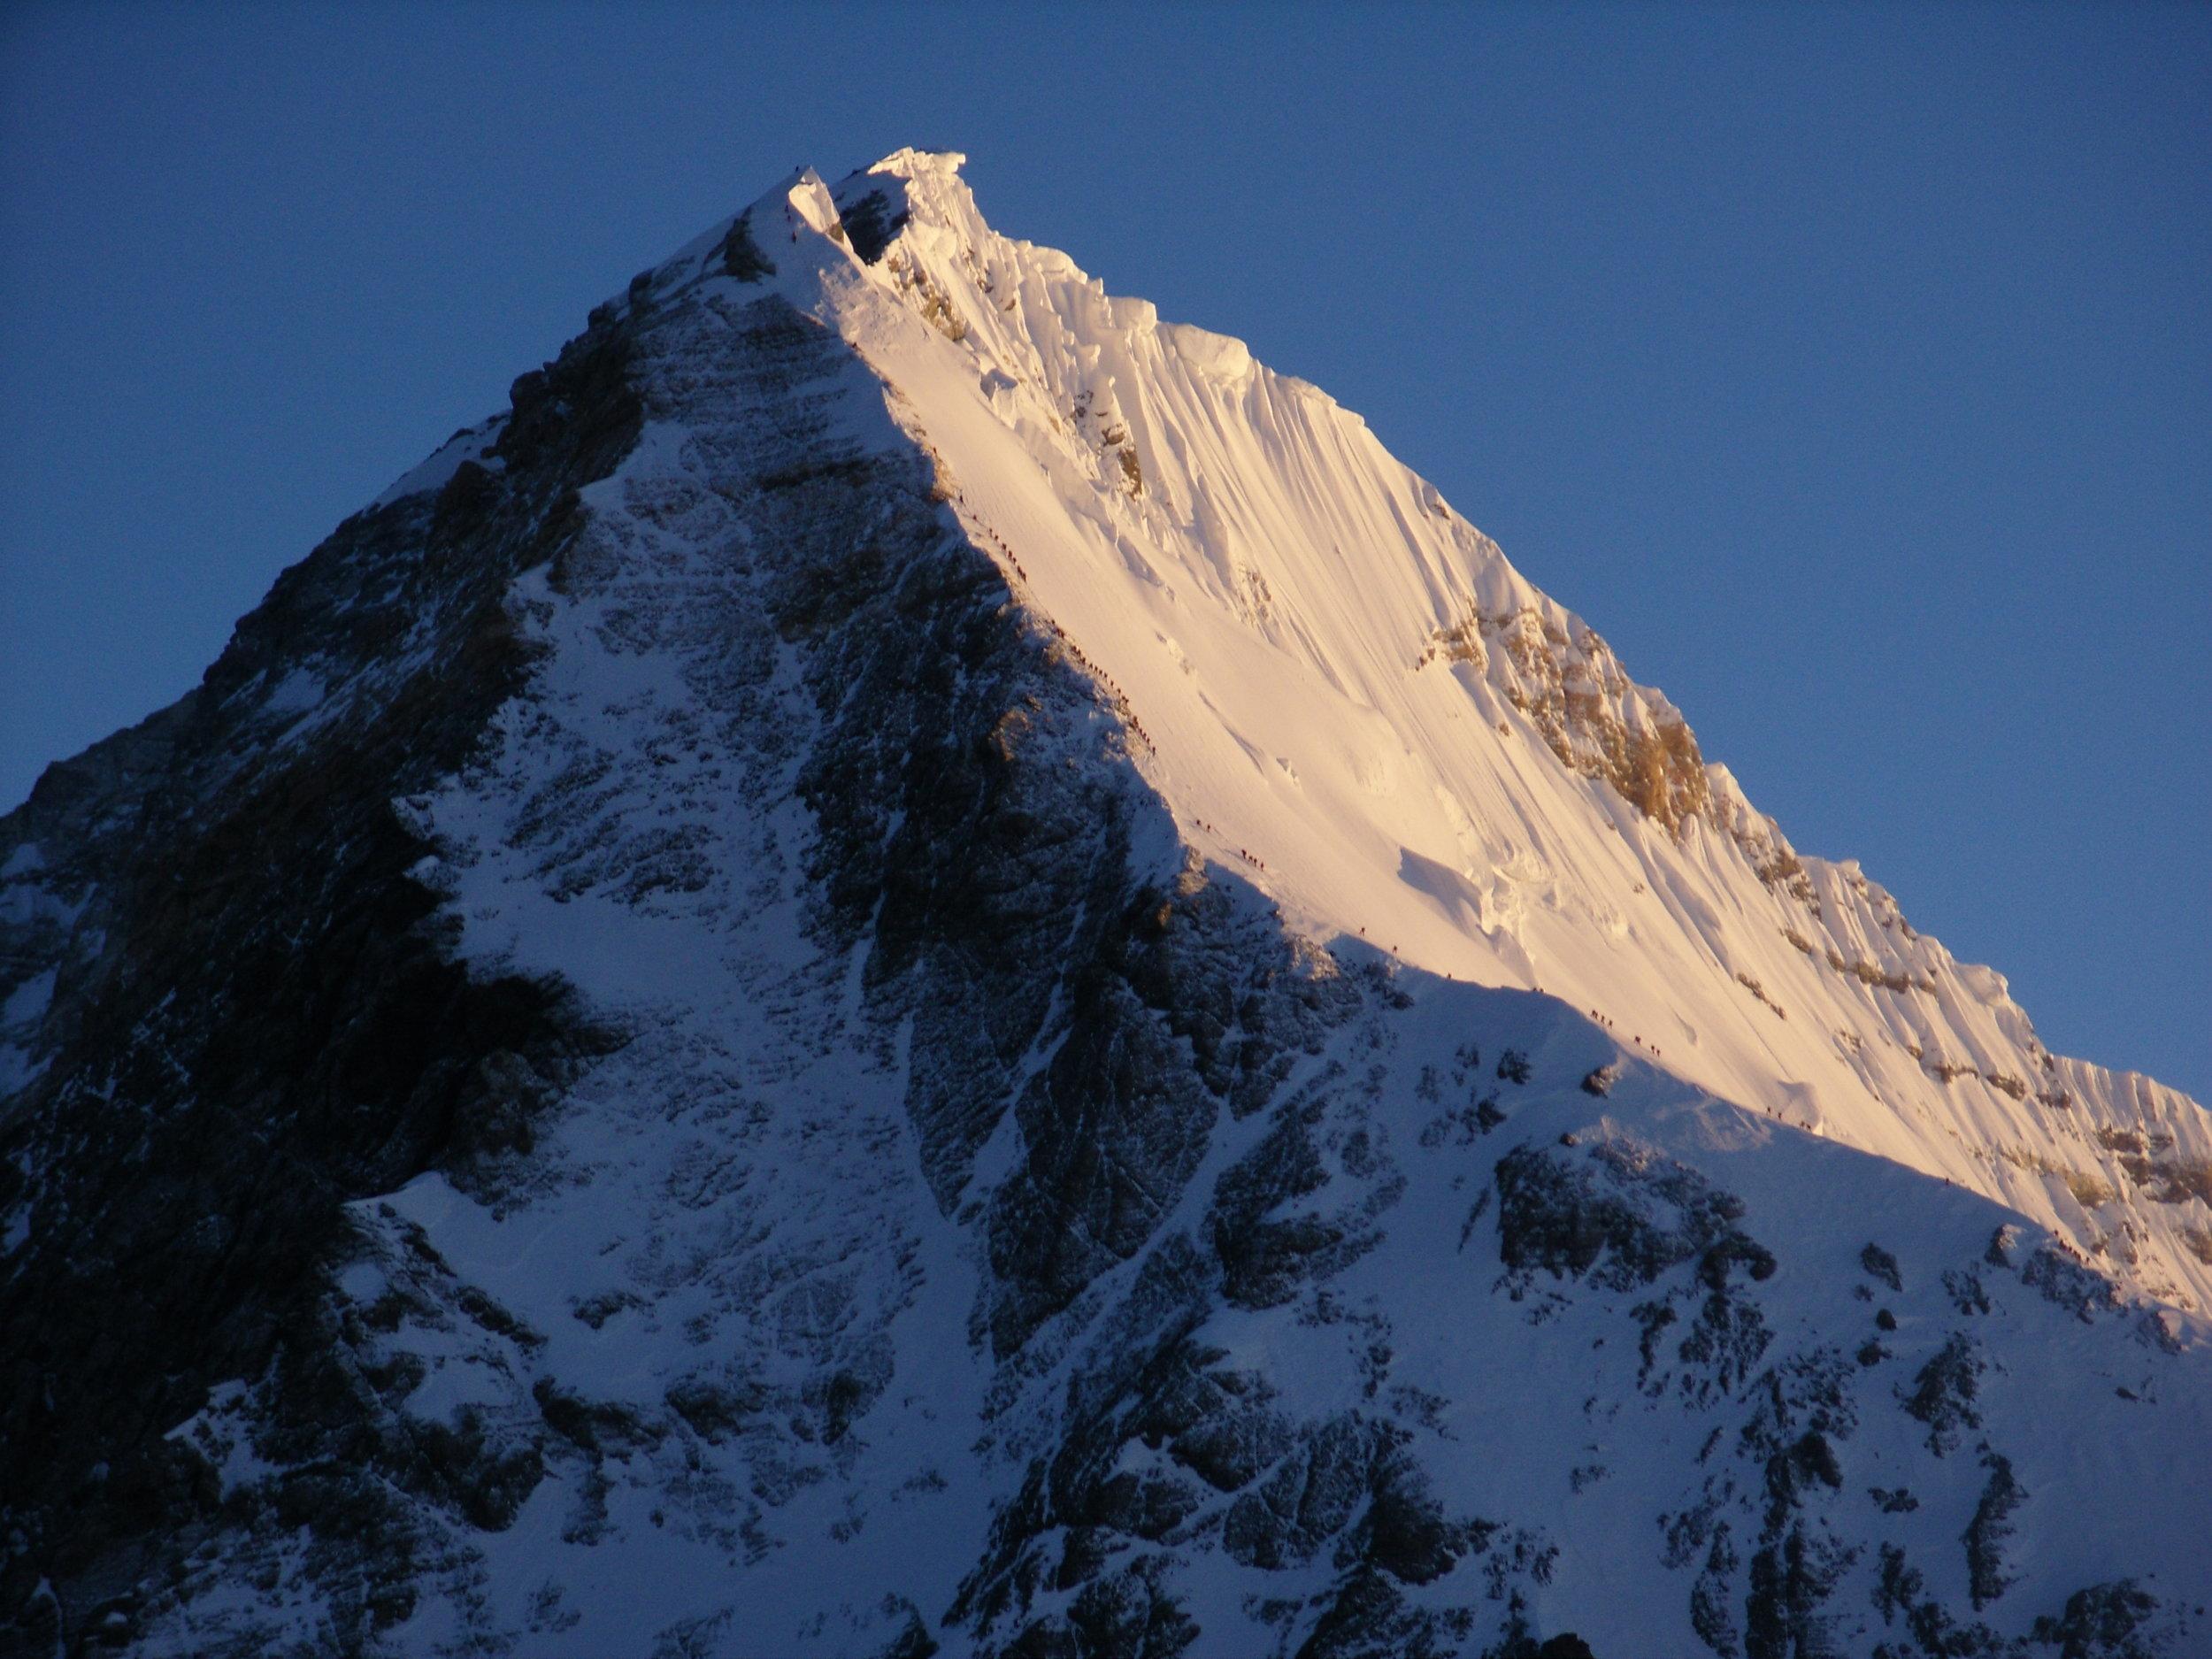 Everest seen from Lhotse